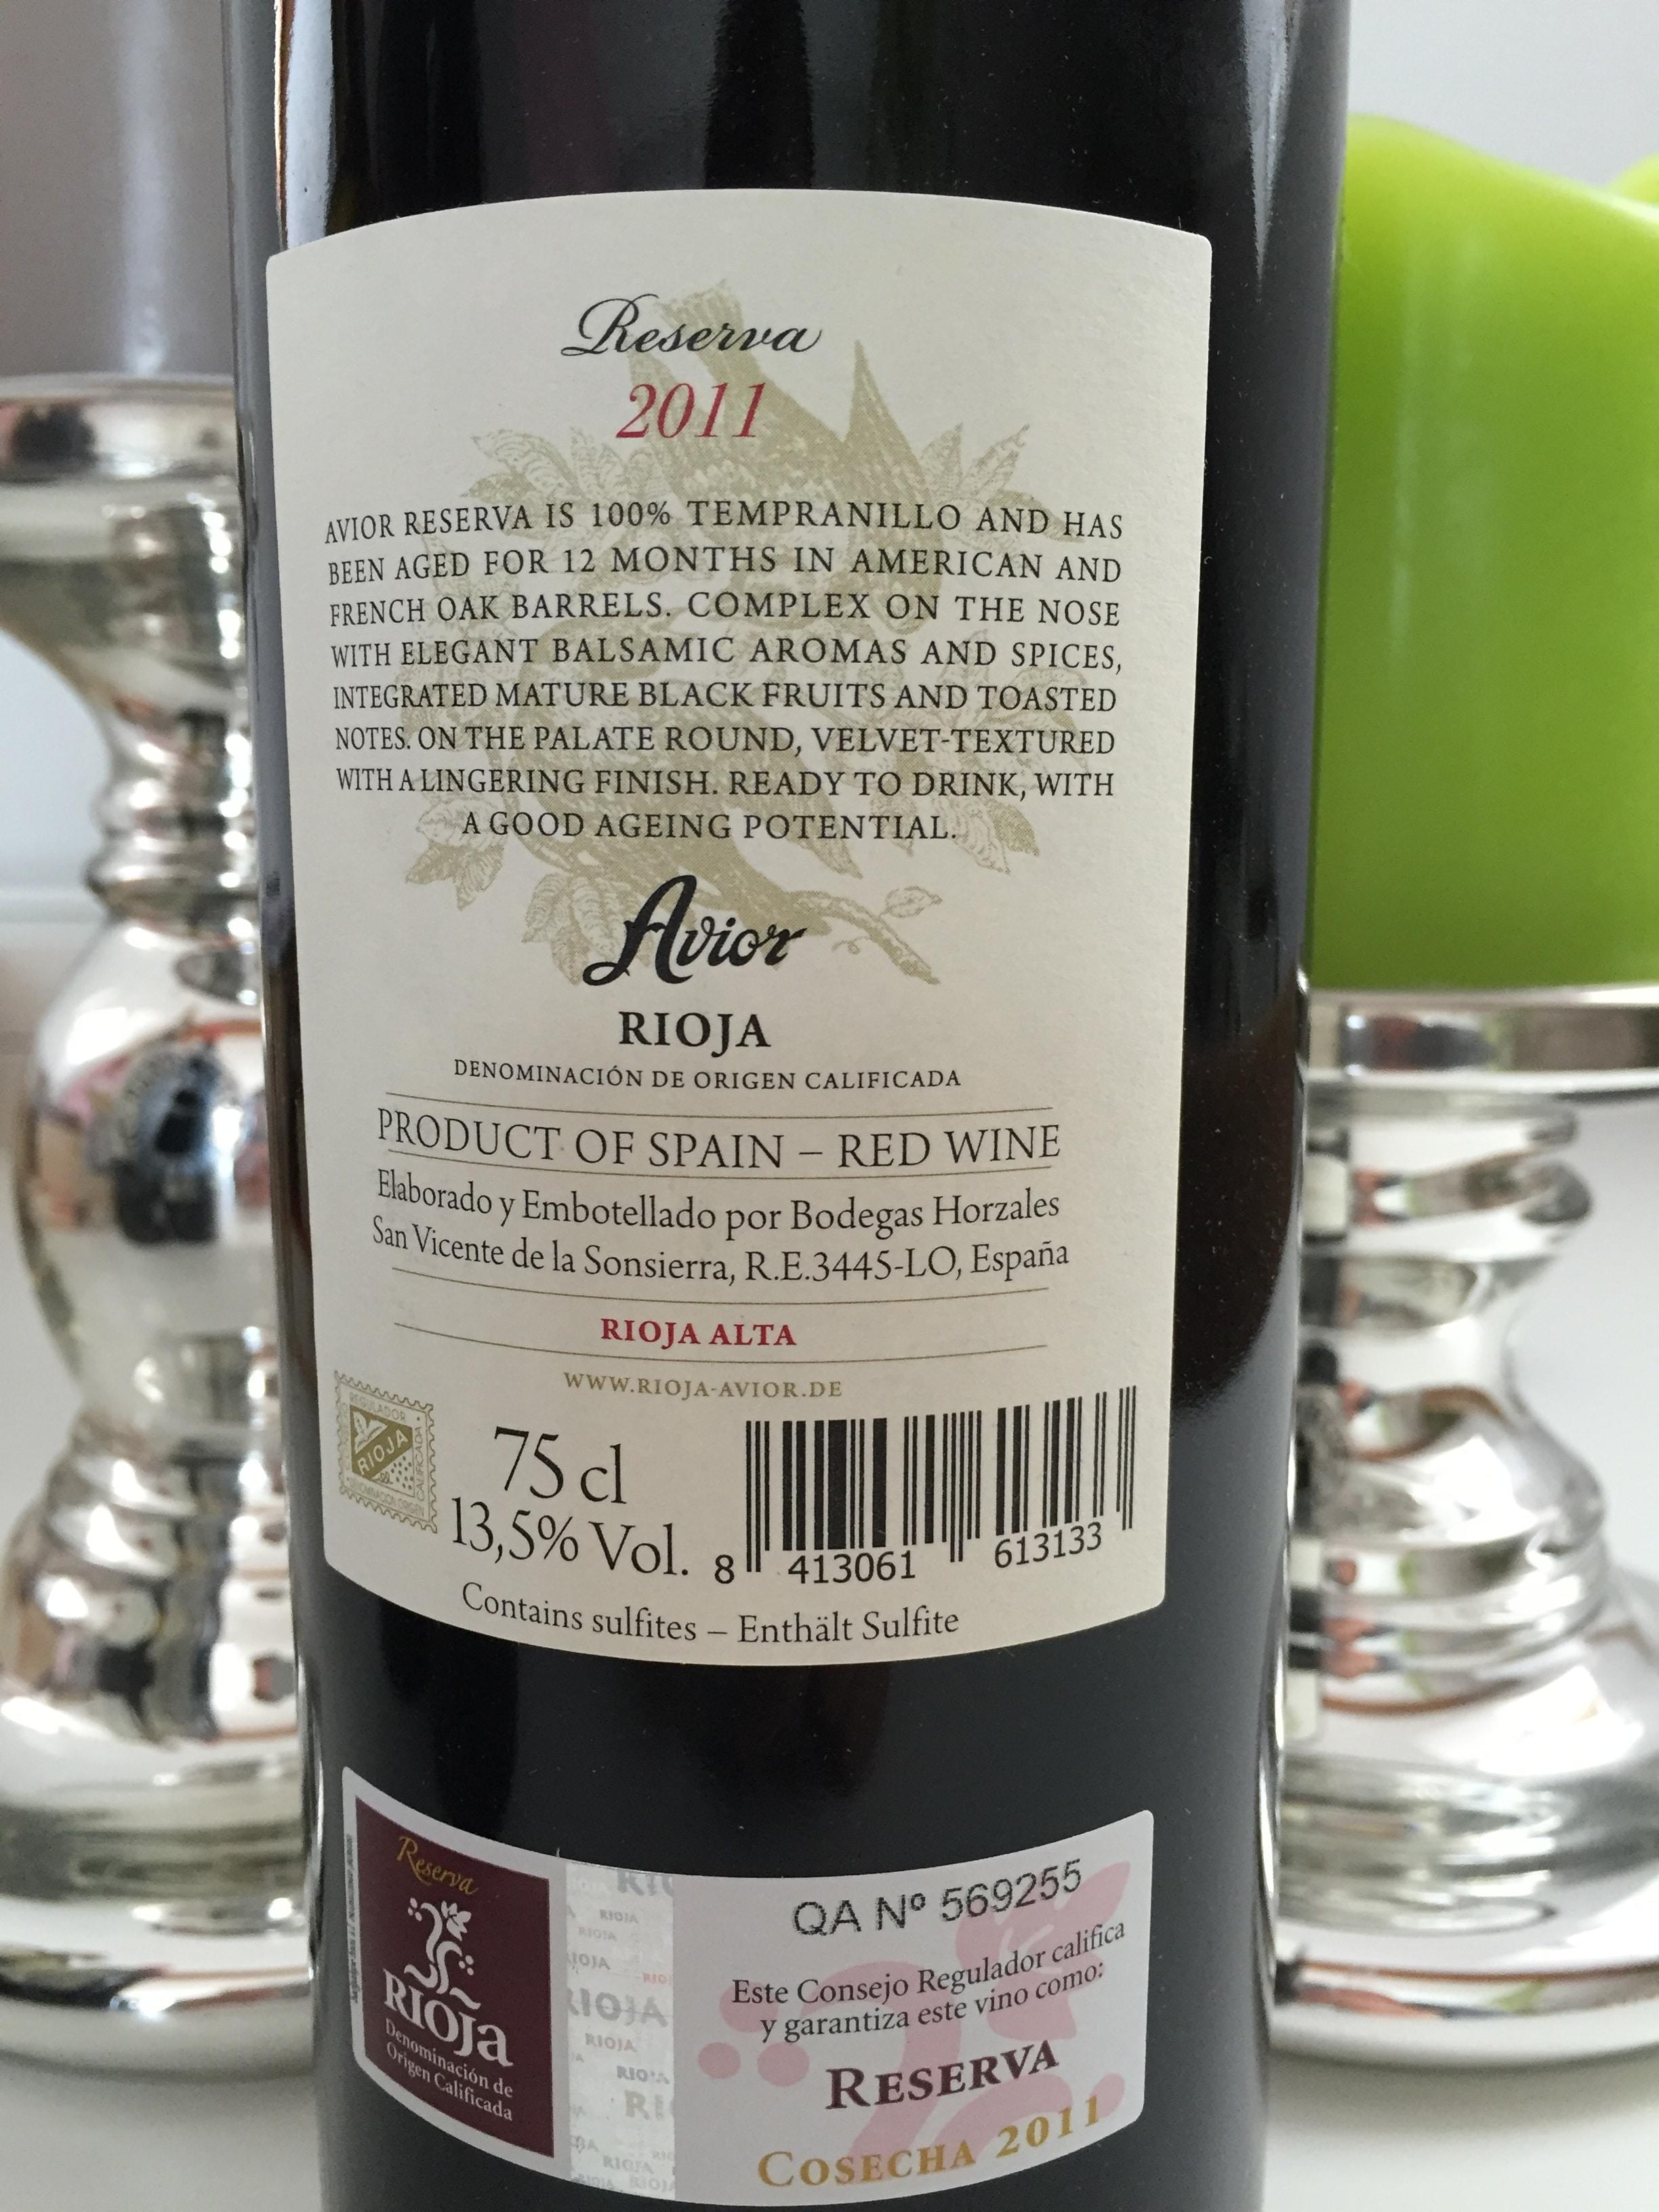 Avior Rioja Reserva Rückseite